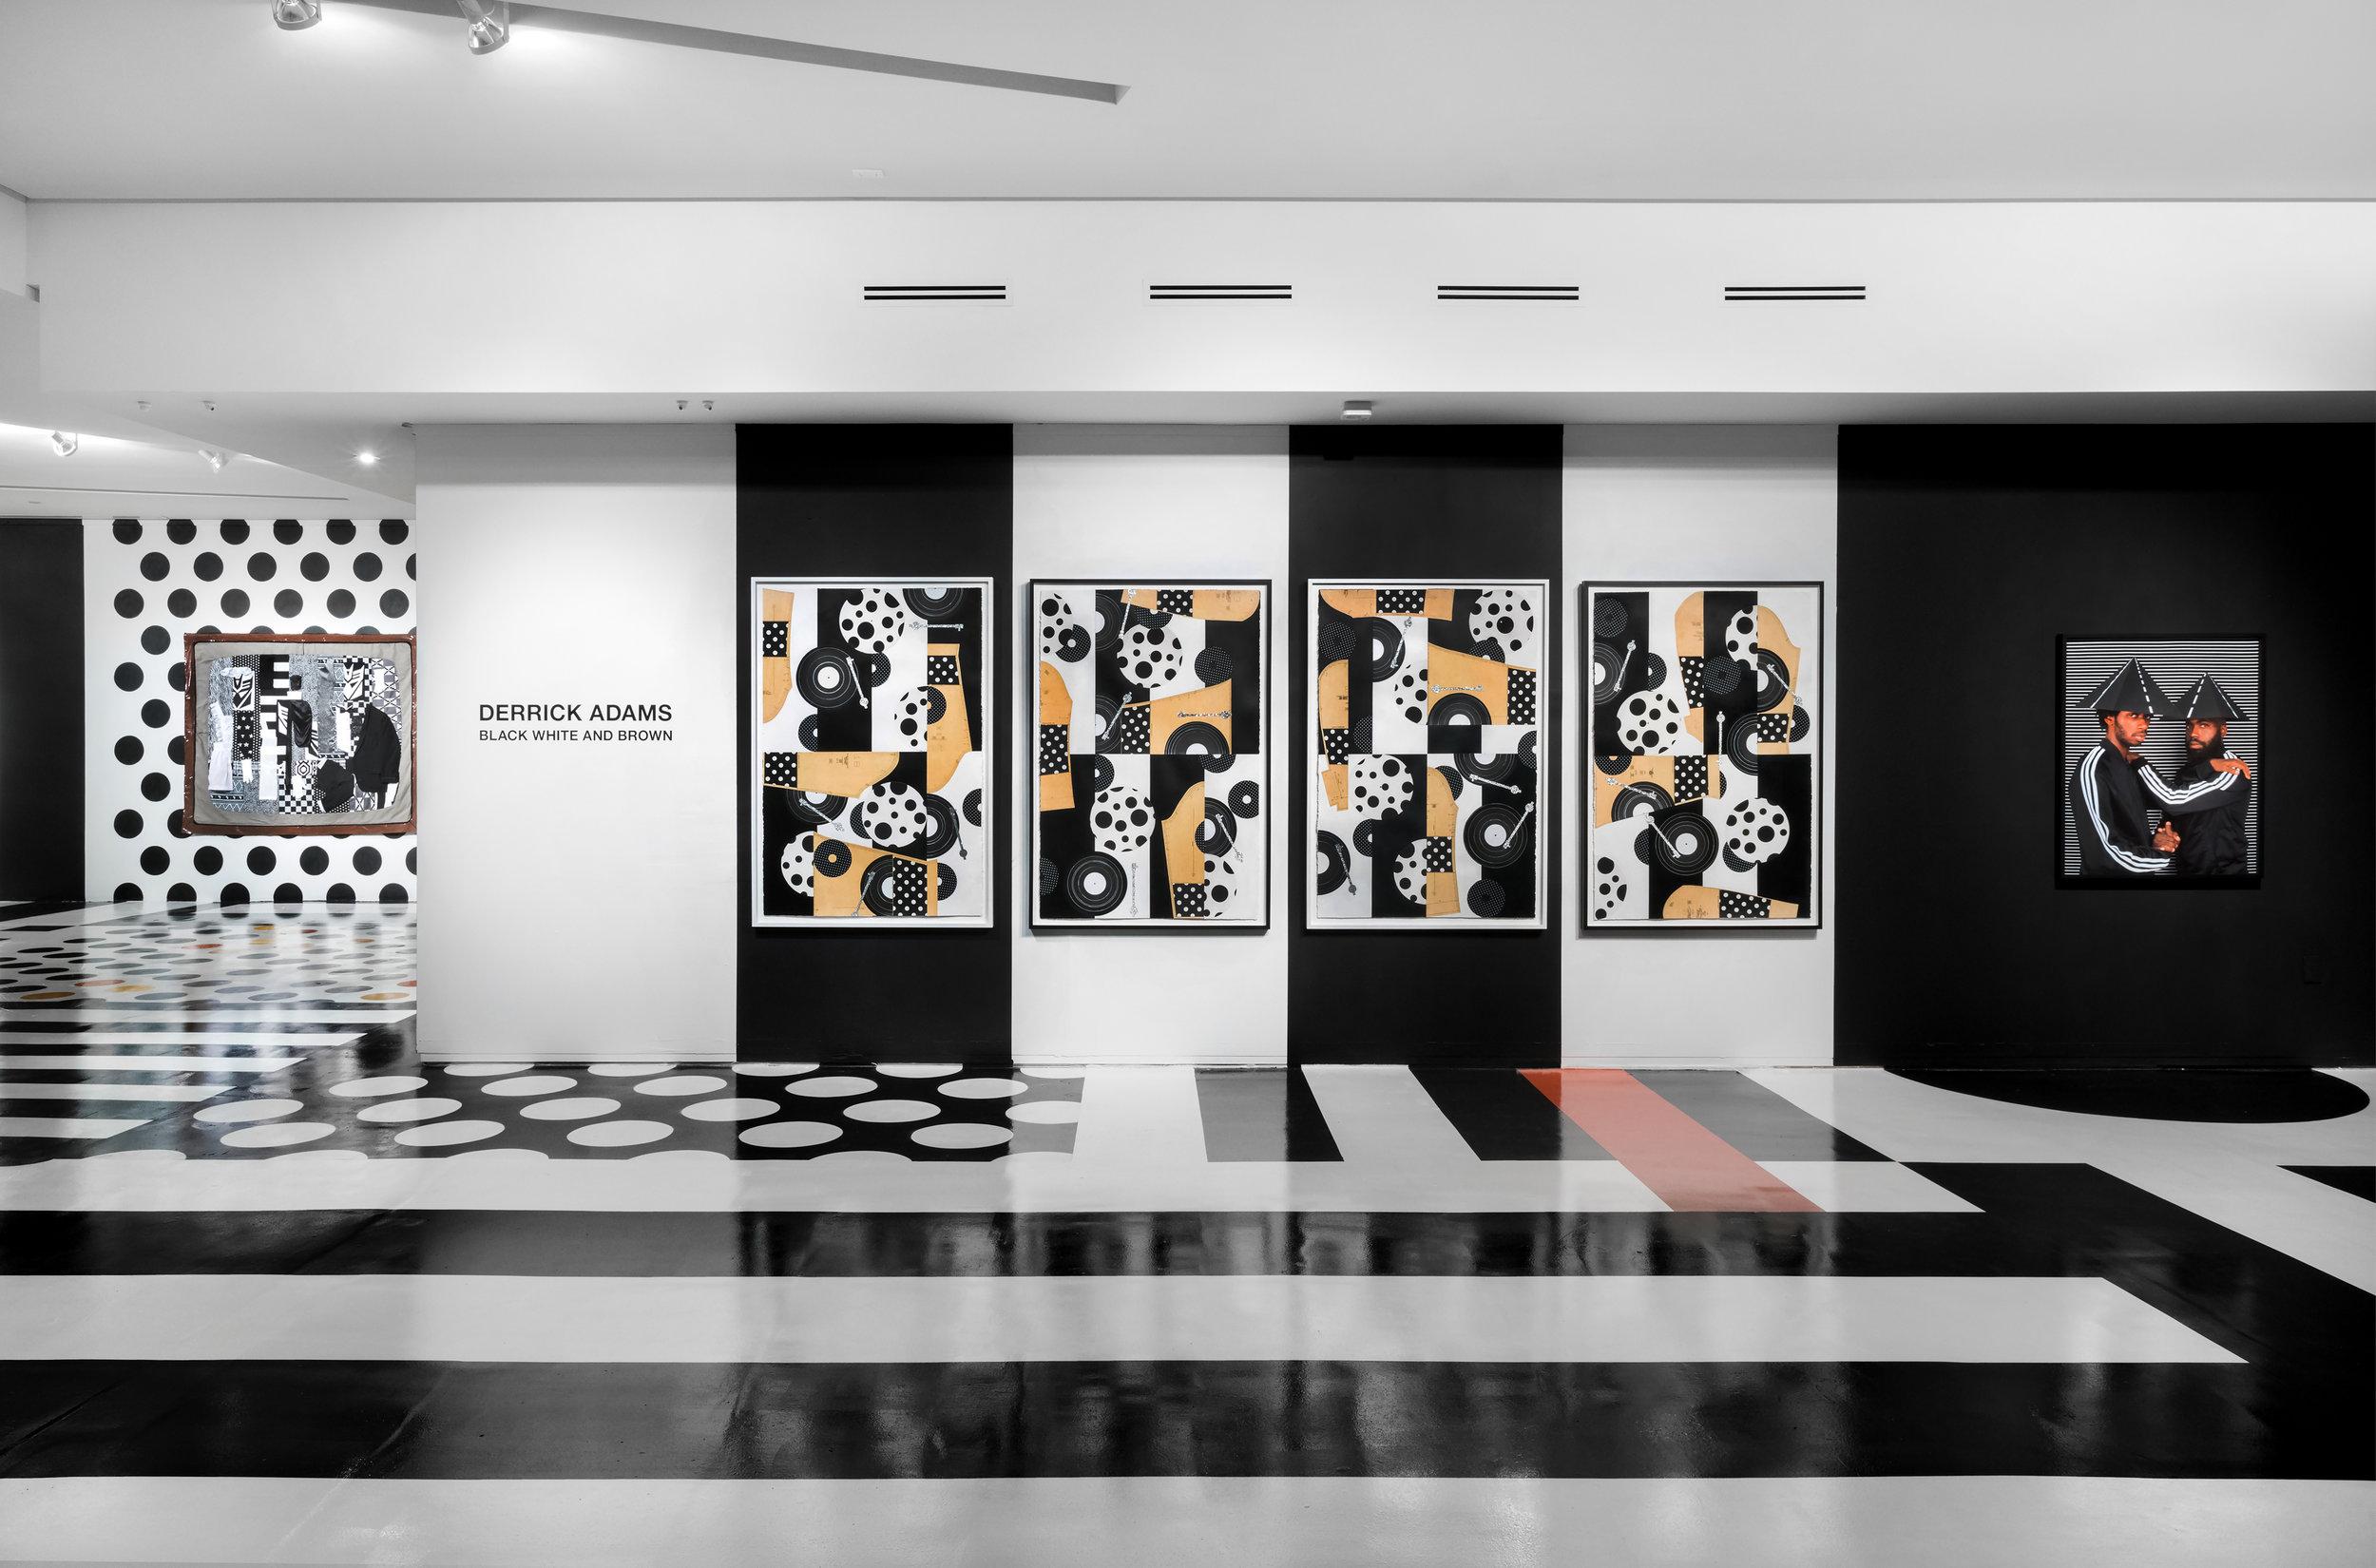 Derrick Adams Black White and Brown PRIMARY Miami 2017 install.jpg